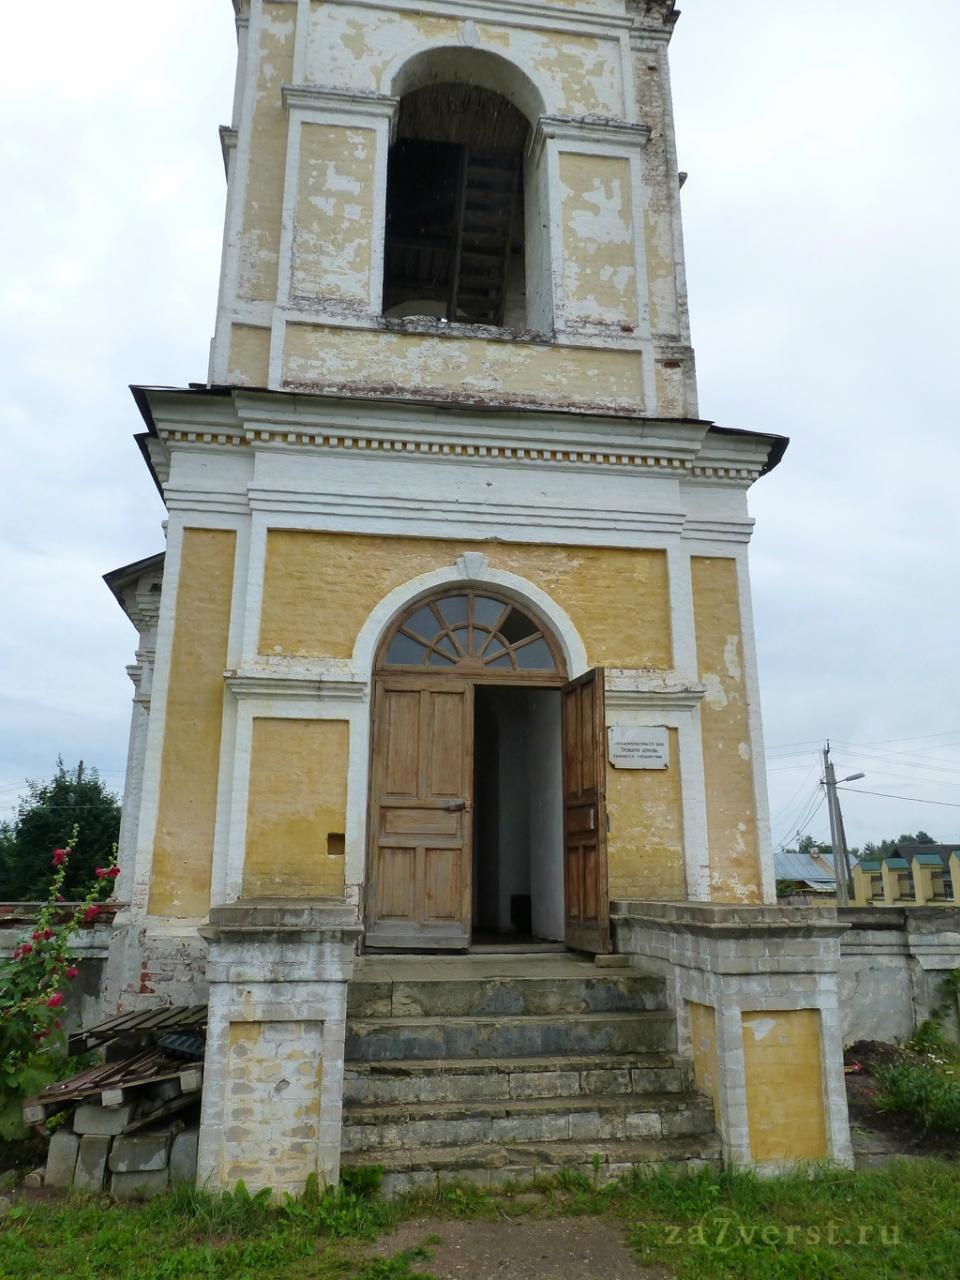 Троицкая церковь, Плёс